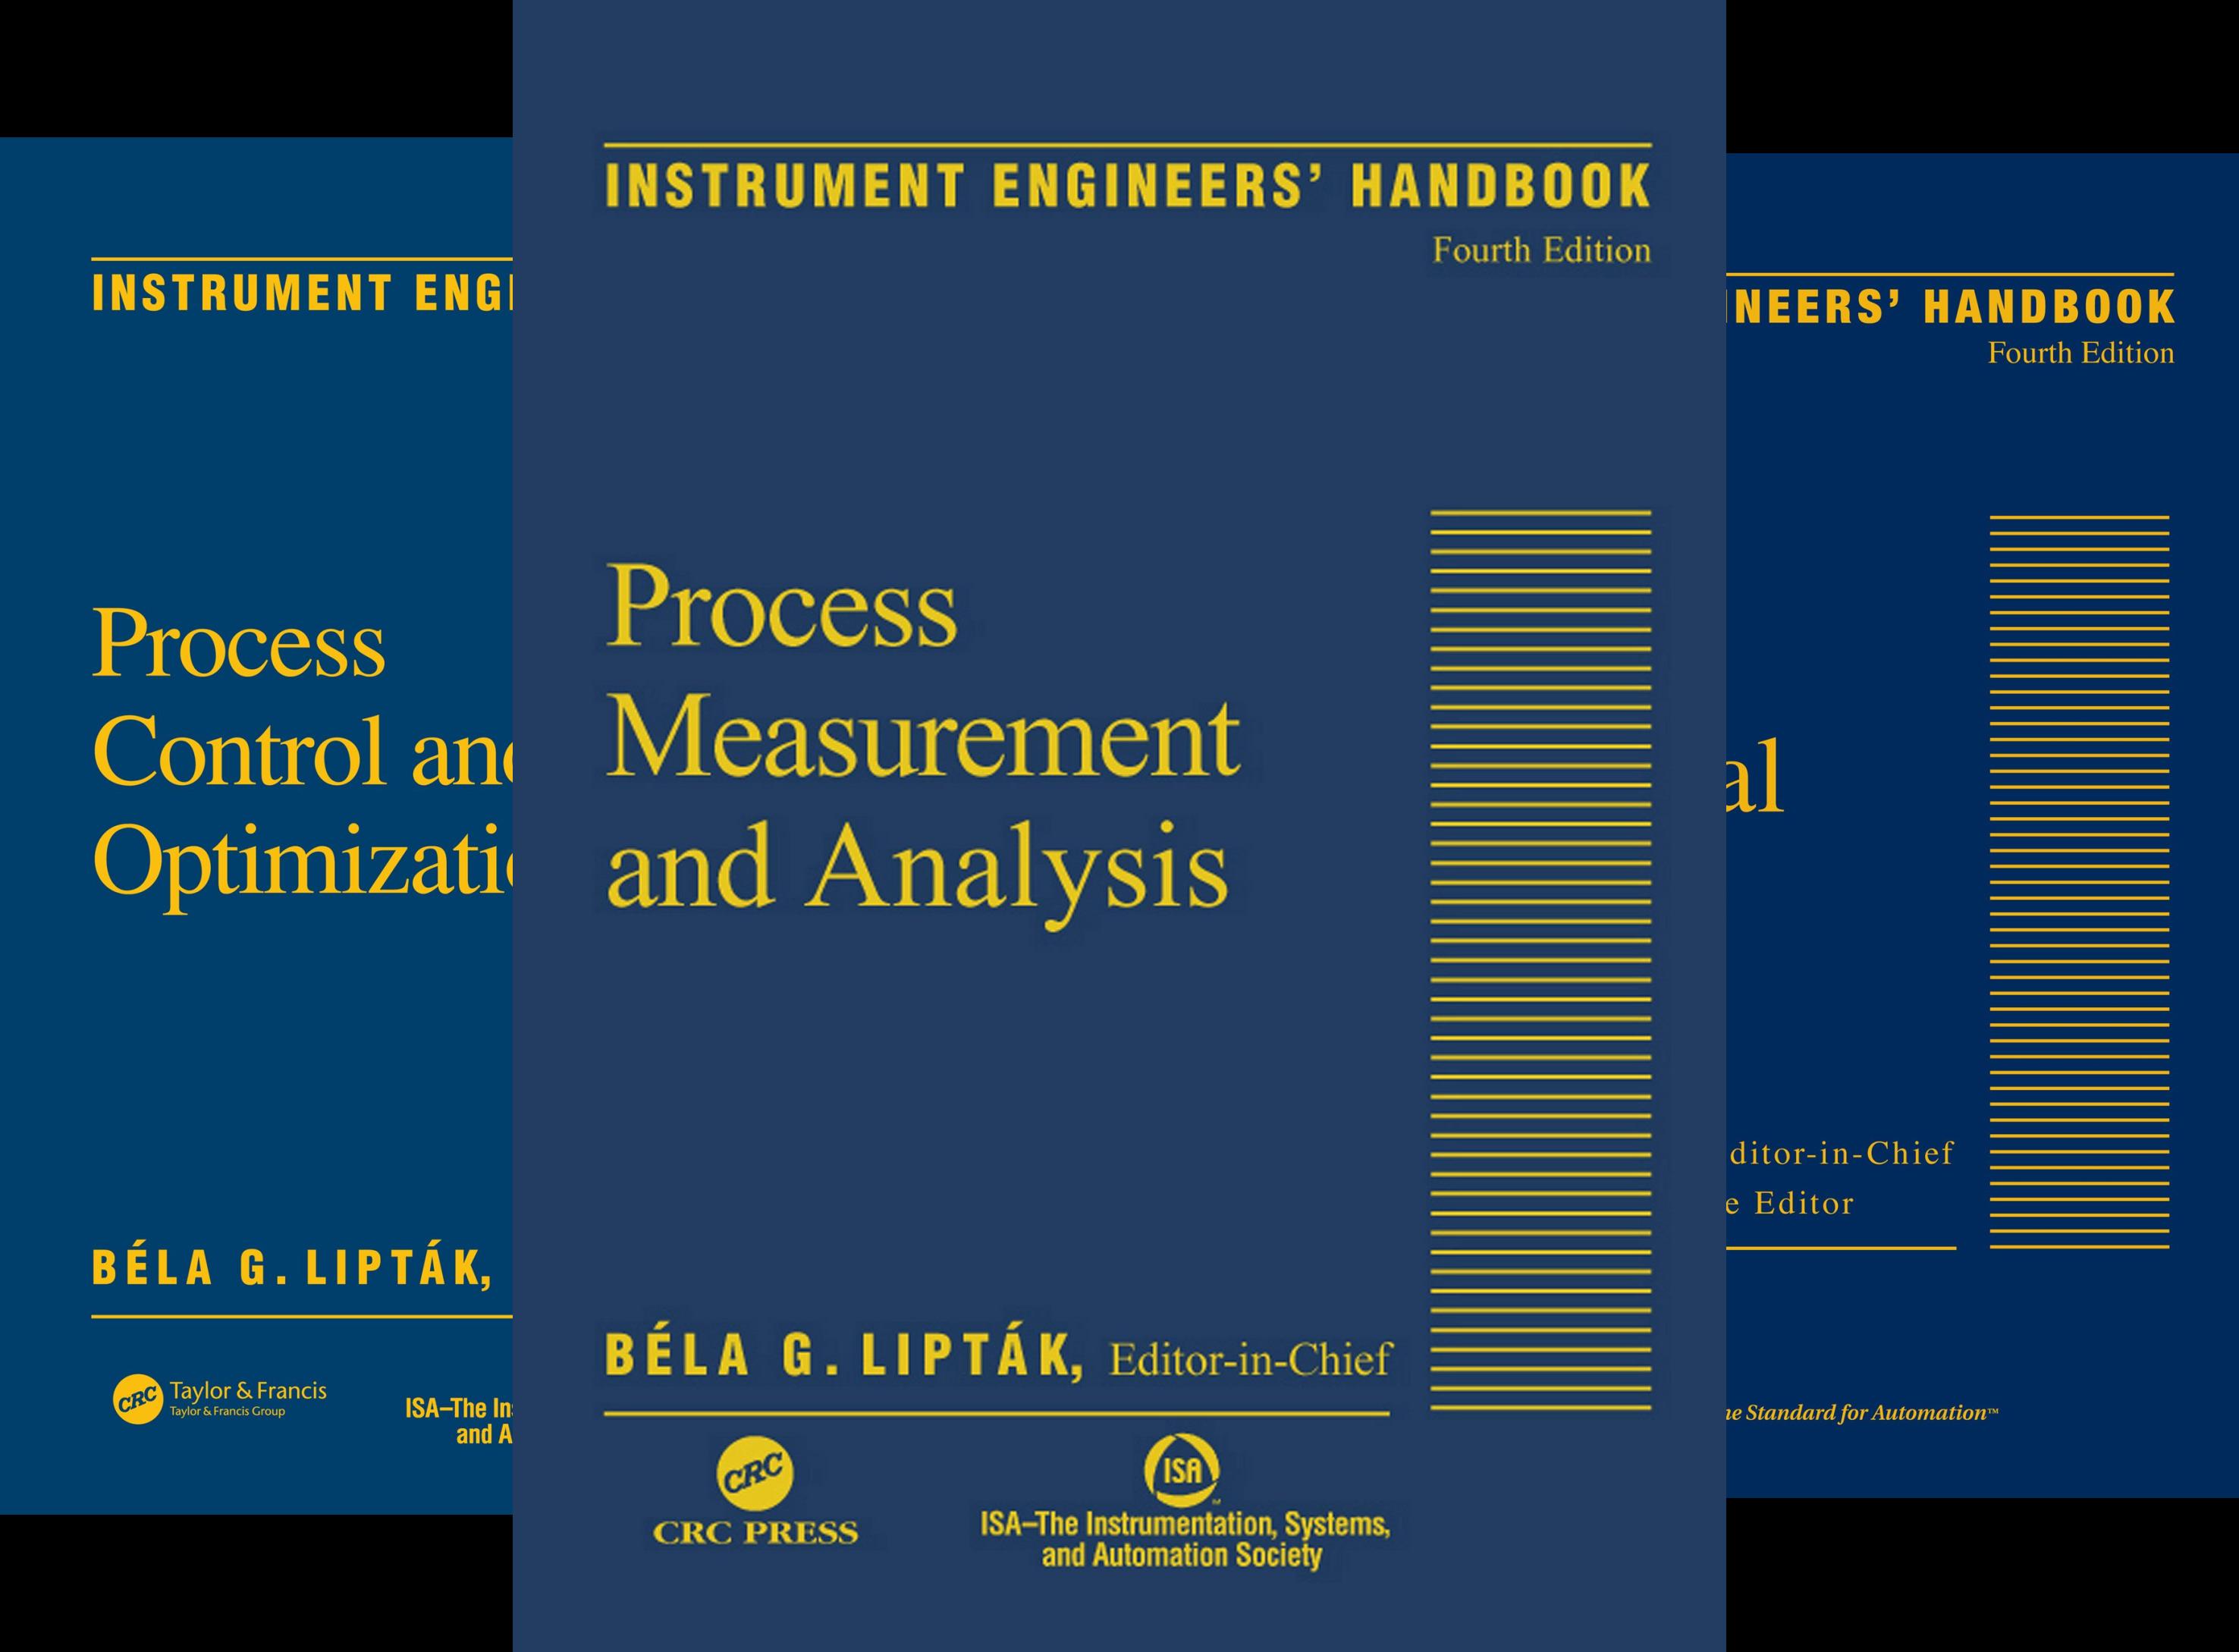 Instrument Engineers Handbook - Instrument Engineers Handbook, Fourth Edition, Three Volume Set (3 Book Series)